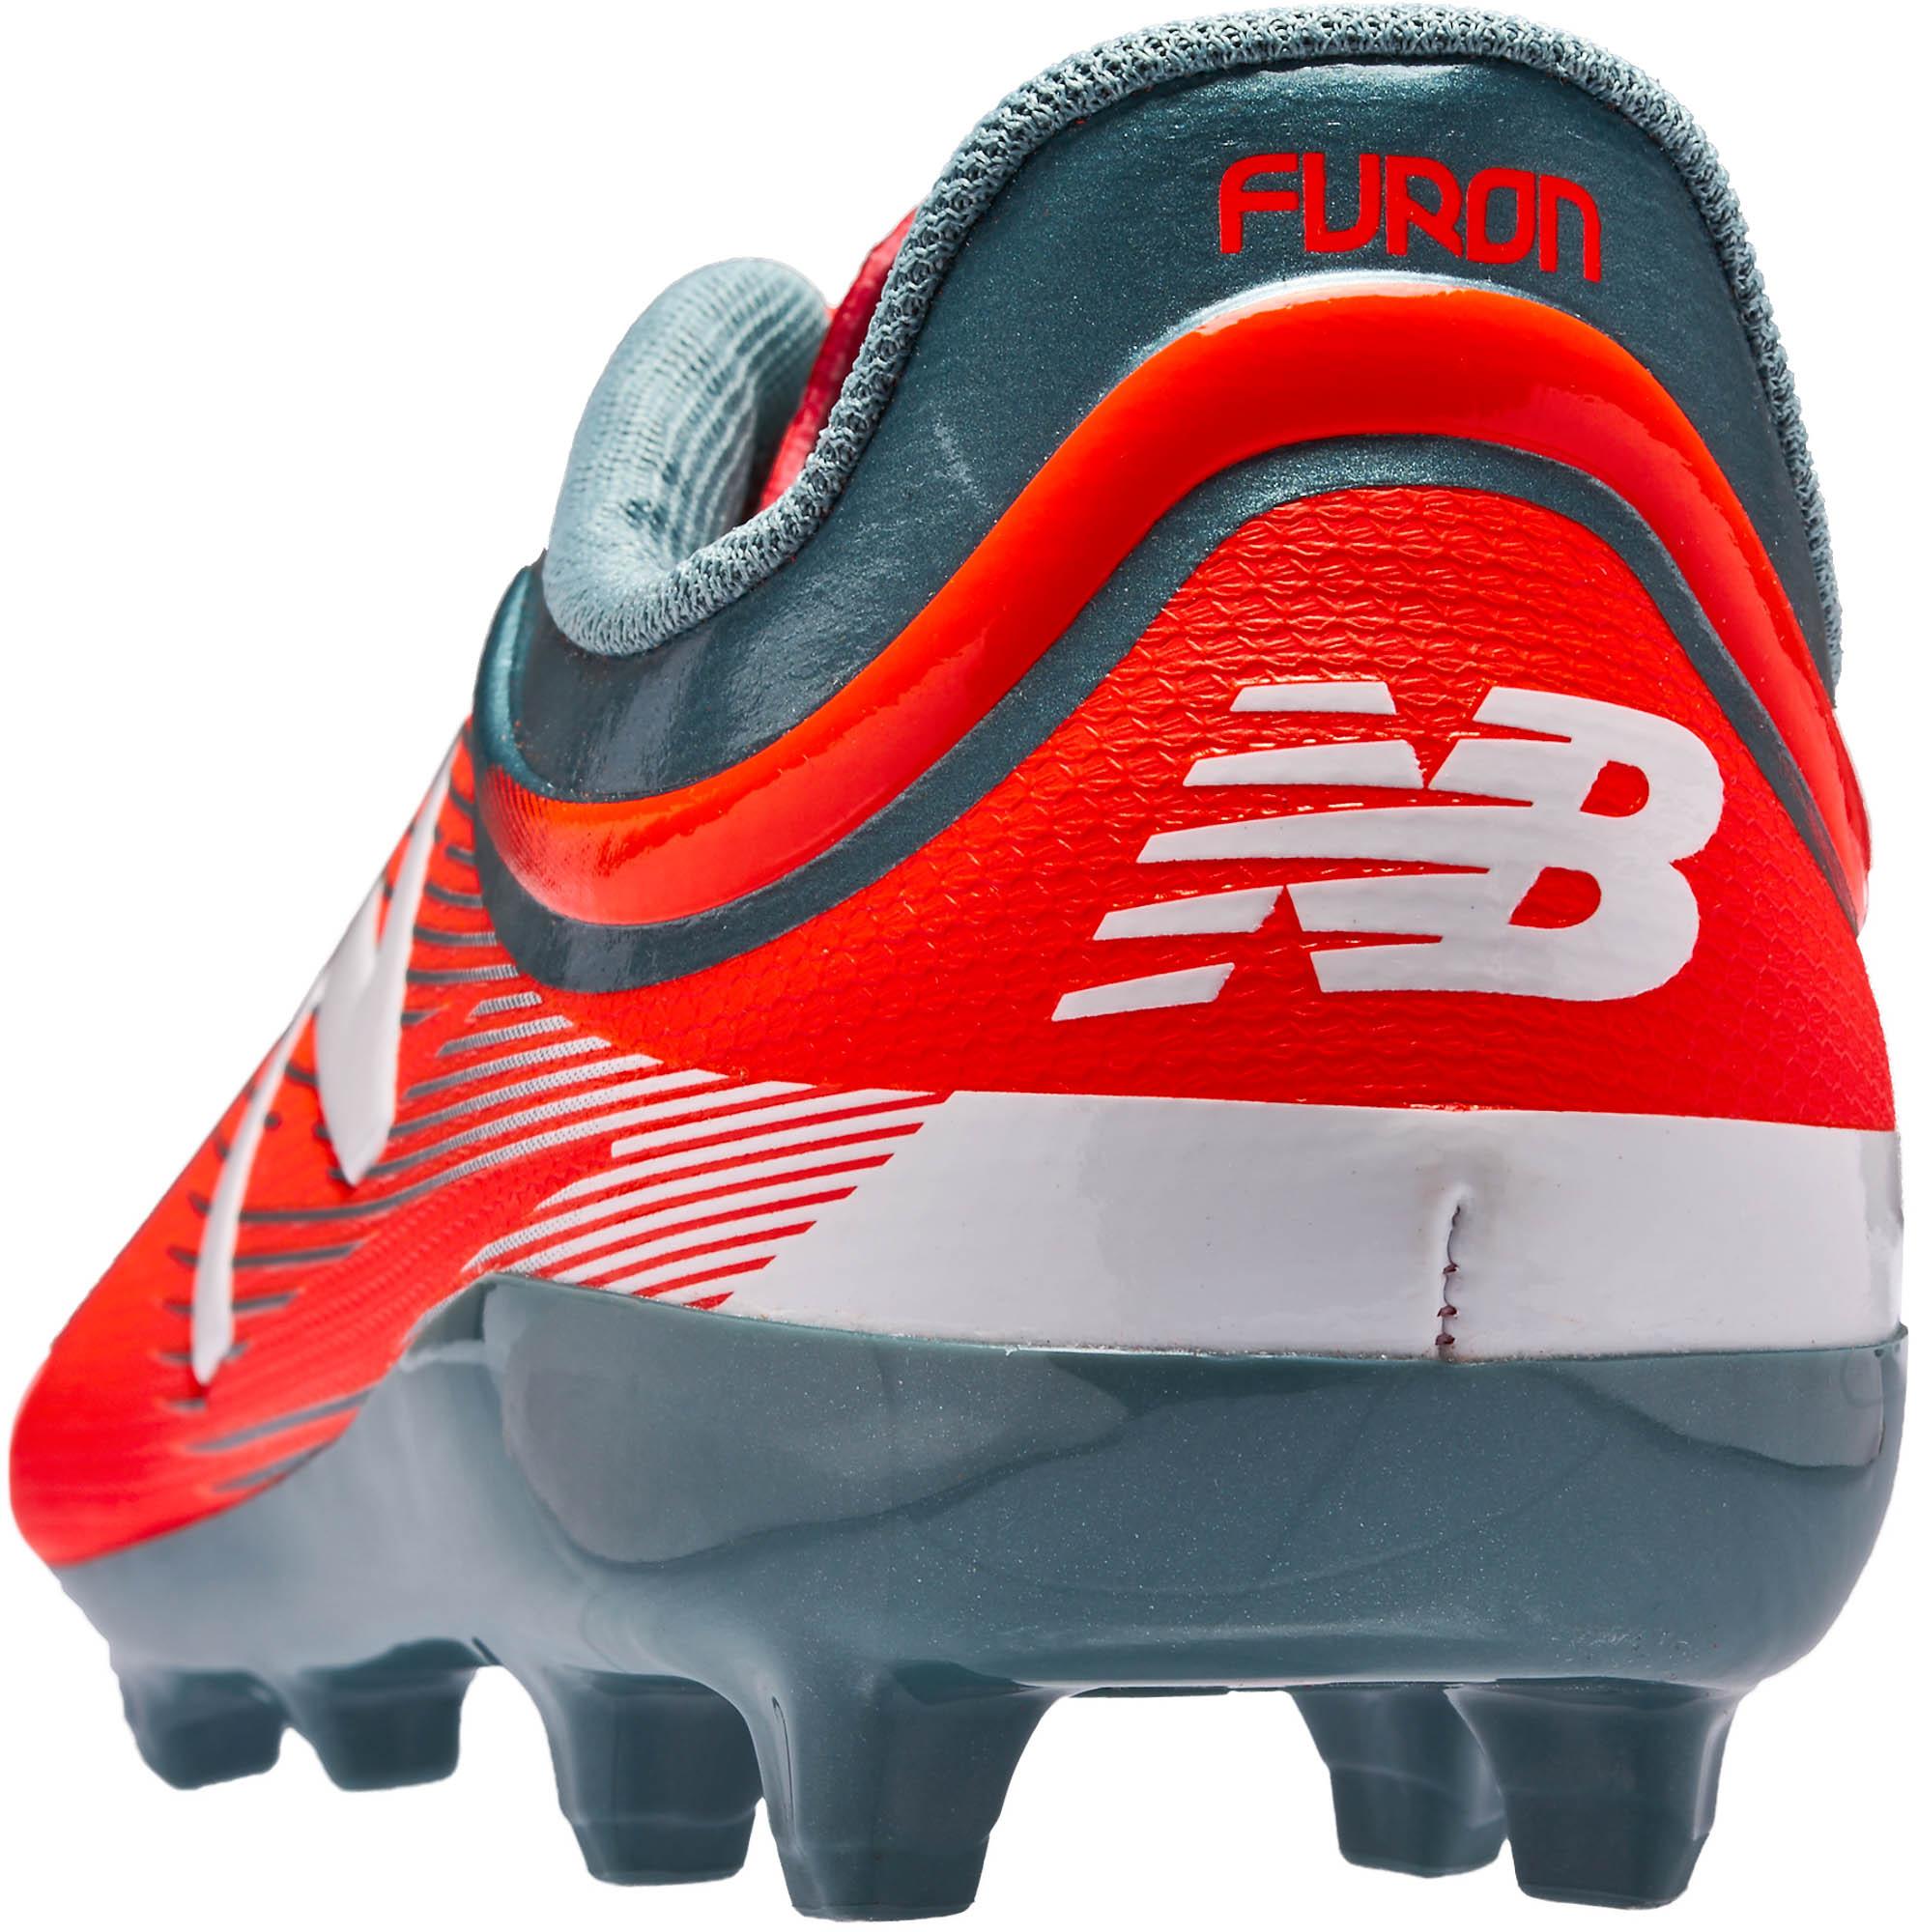 Sneakers New Balance Jsfudfot tx3iLBZ